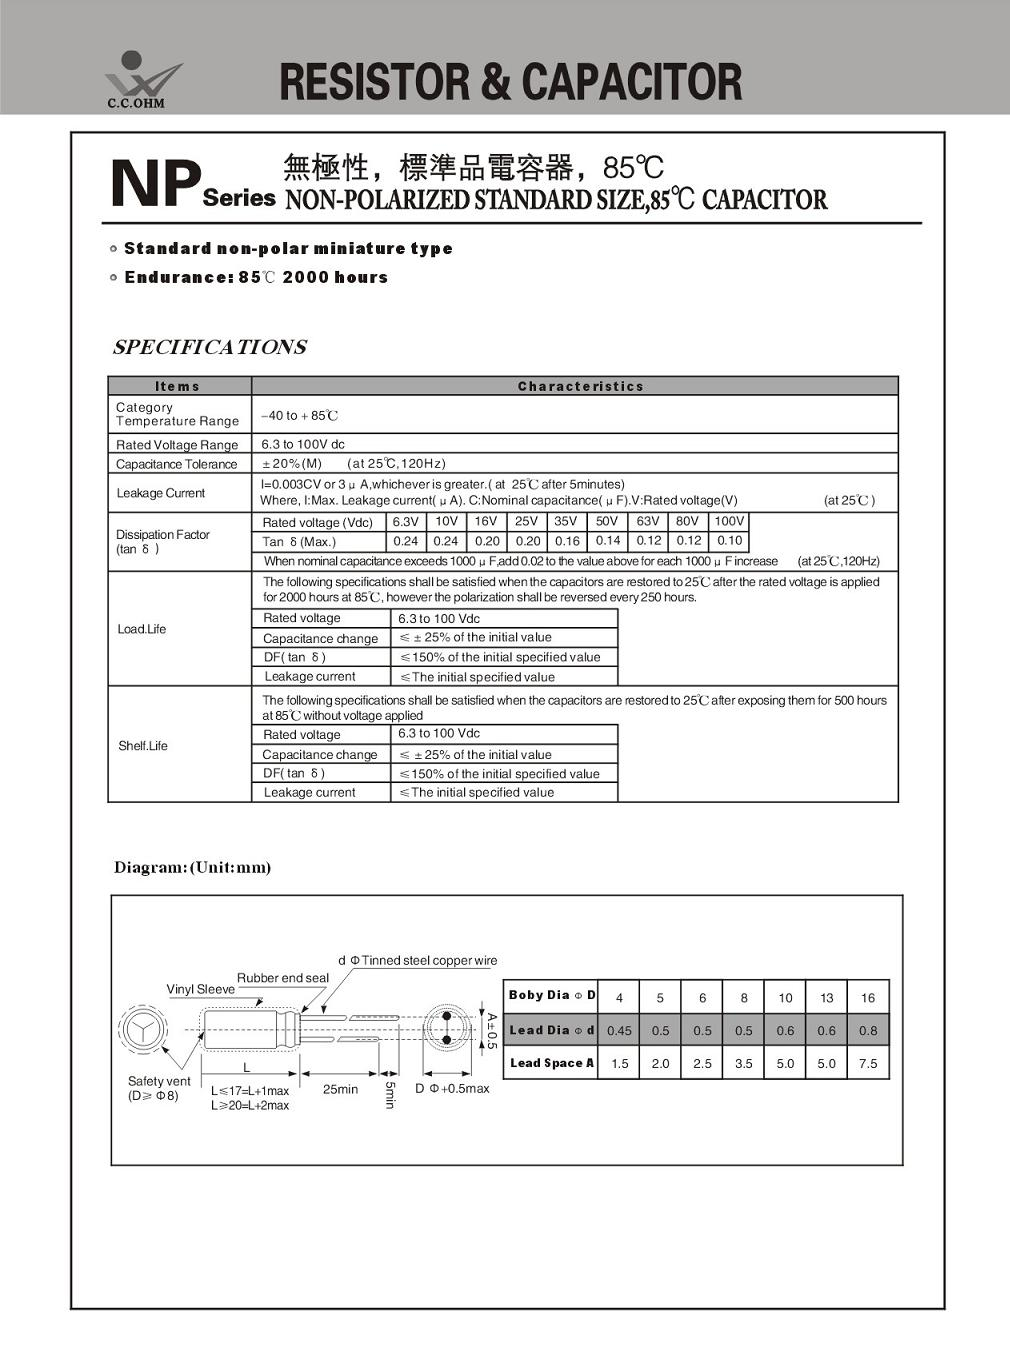 proimages/NP-1_wn.JPG